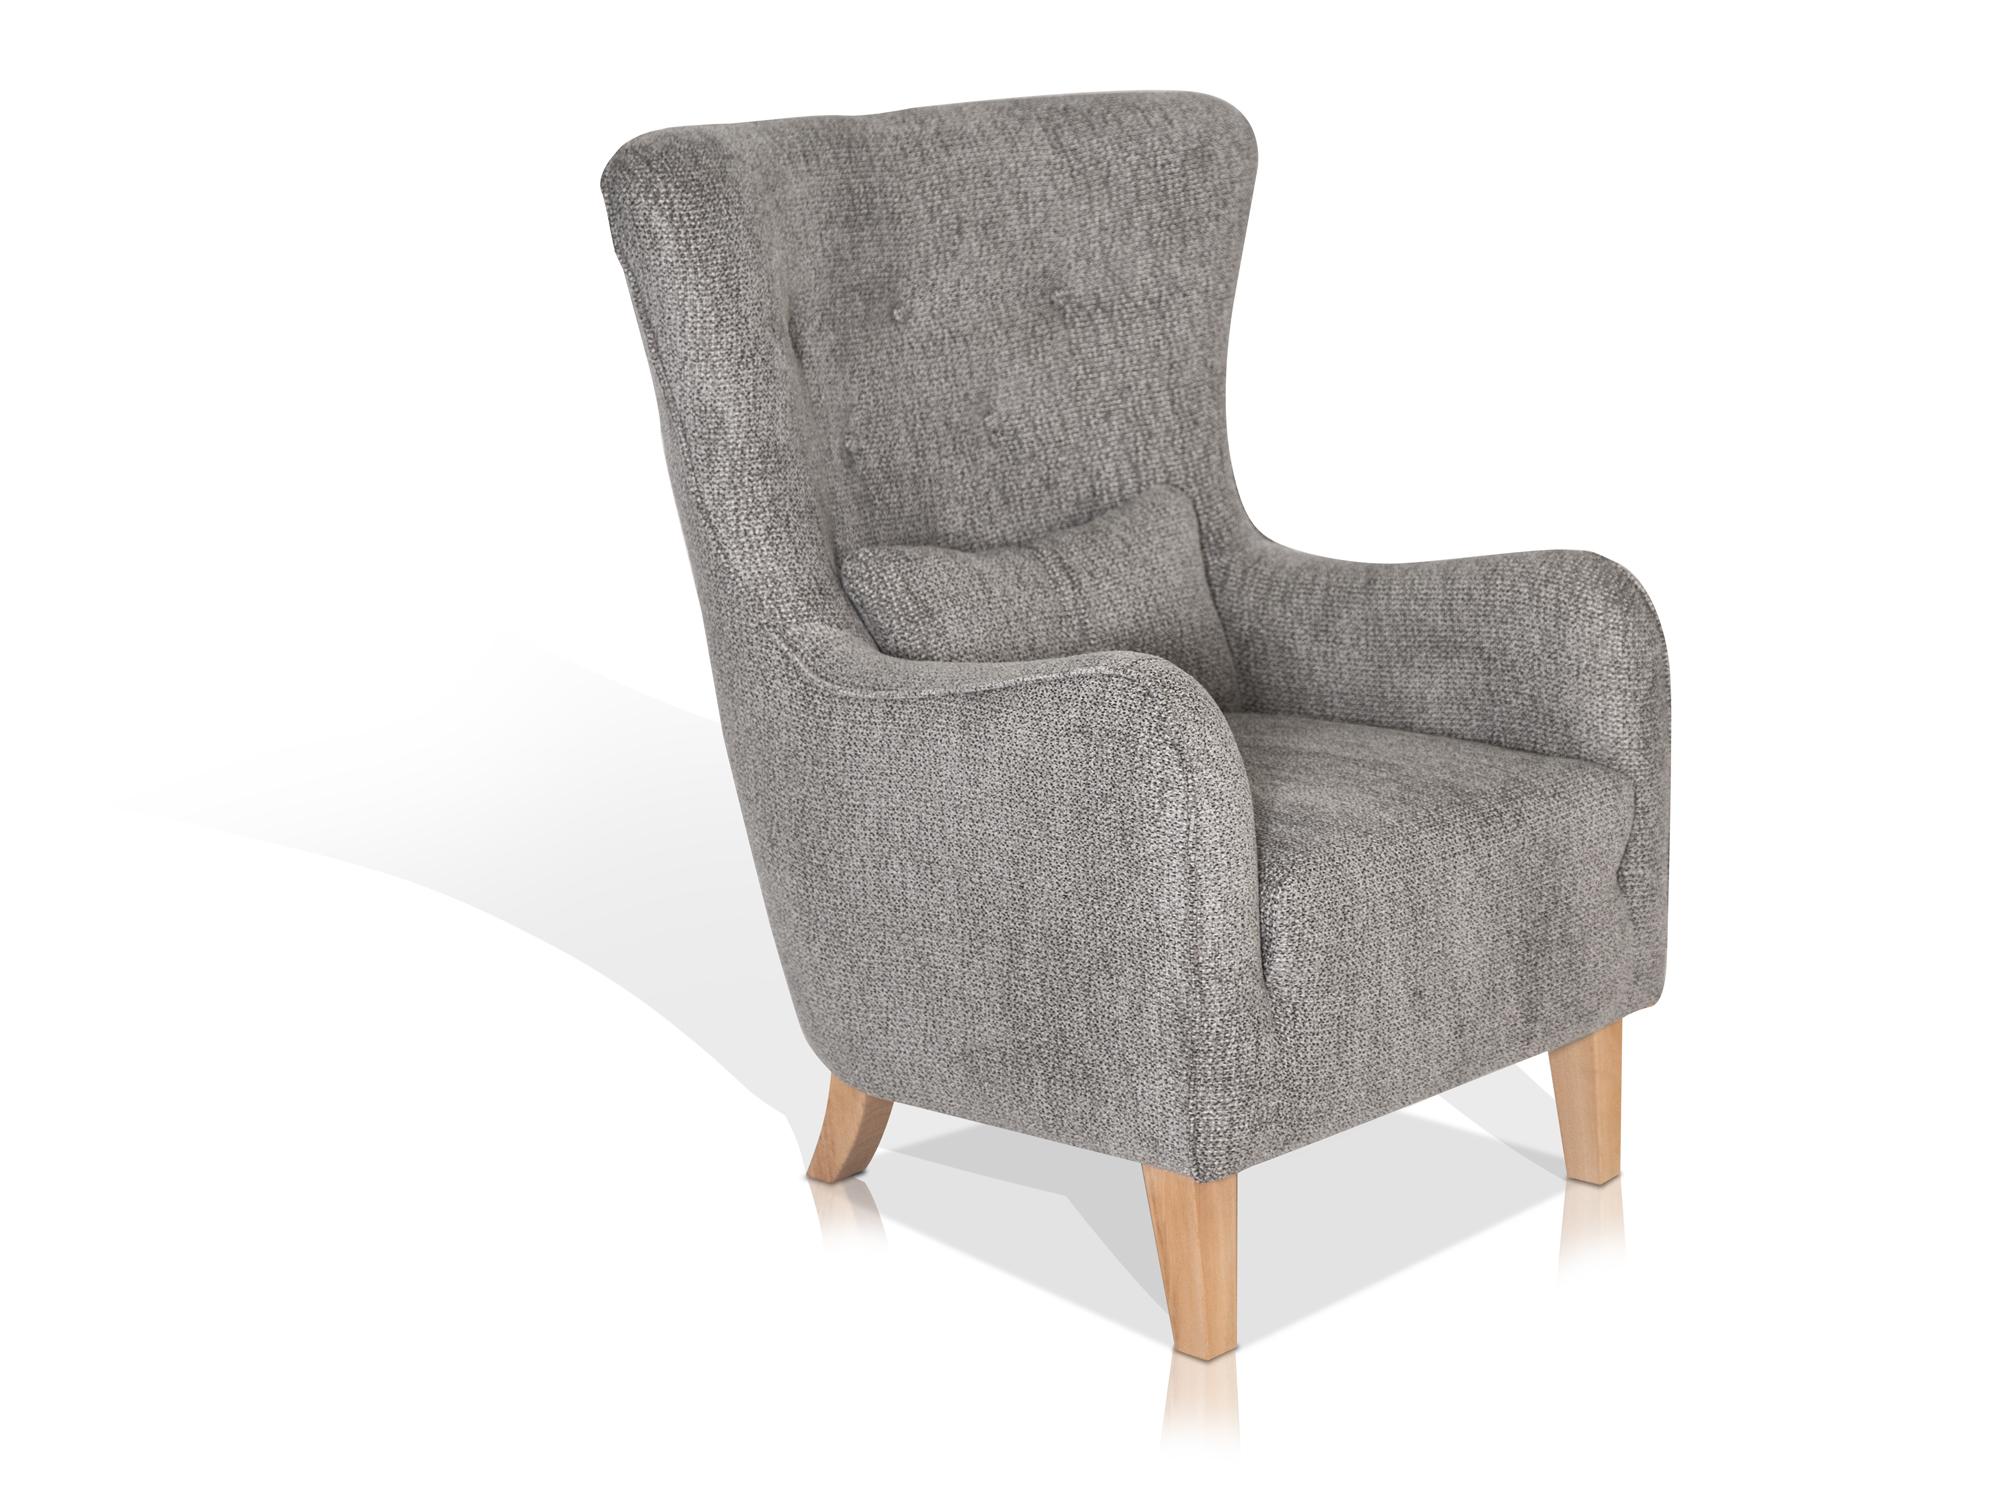 riga ohrensessel armchair grau. Black Bedroom Furniture Sets. Home Design Ideas